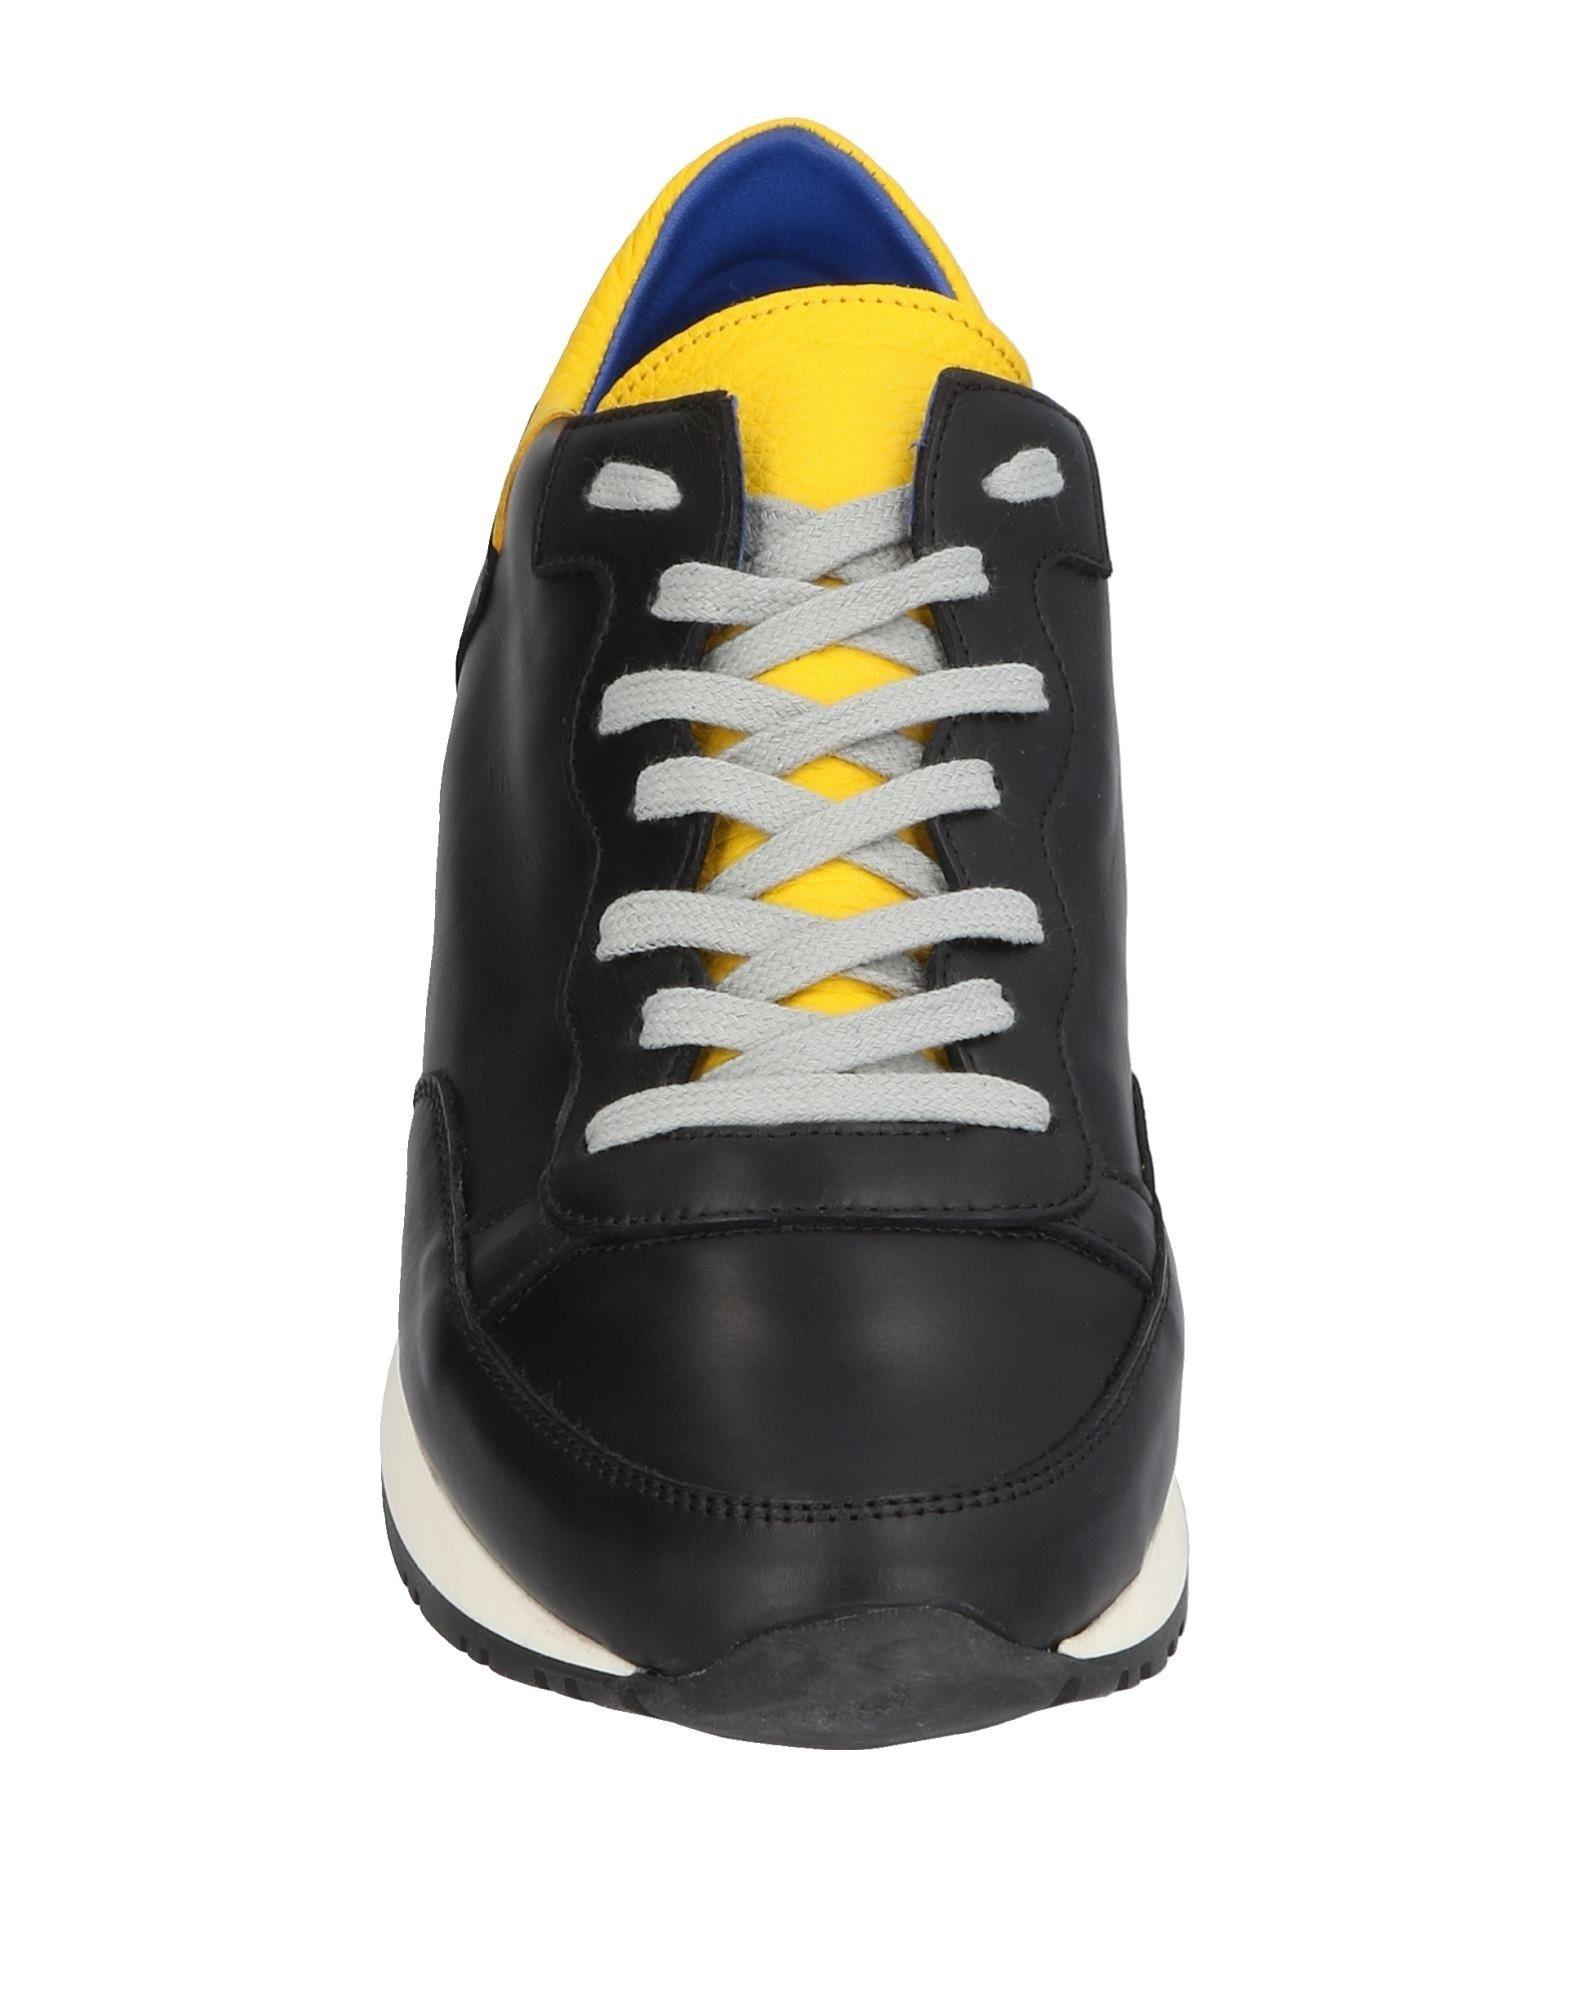 Rabatt echte  Schuhe Quattrobarradodici Sneakers Herren  echte 11433982BX a0fbbf